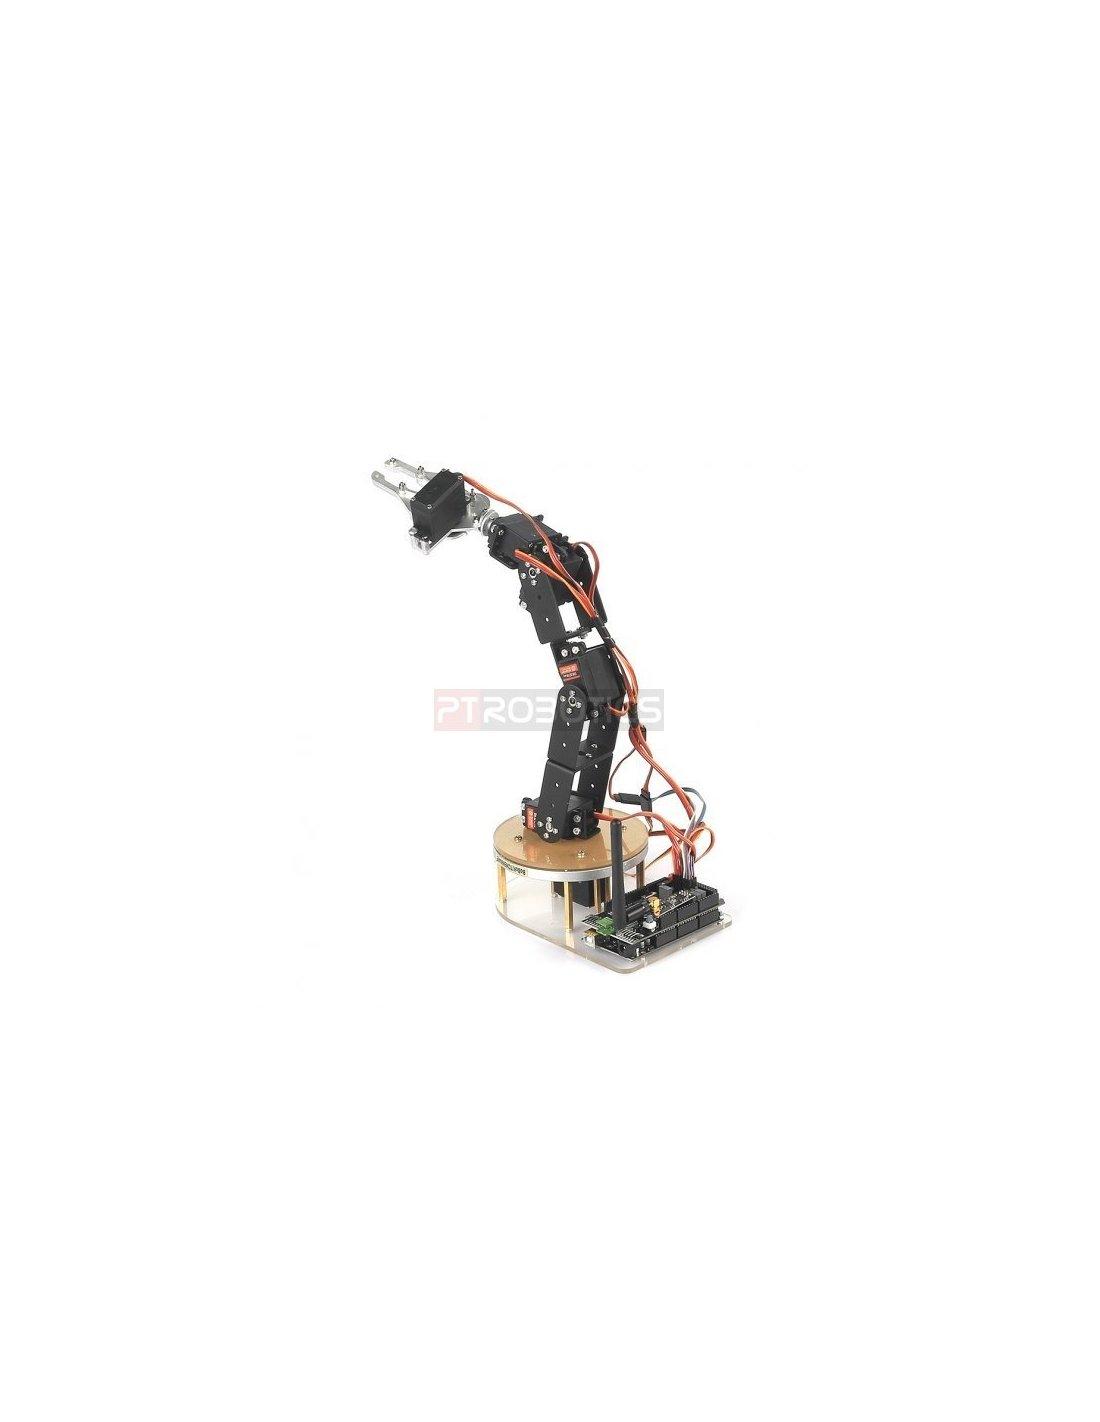 SainSmart 6-Axis Control Palletizing Robot Arm Model DIY w